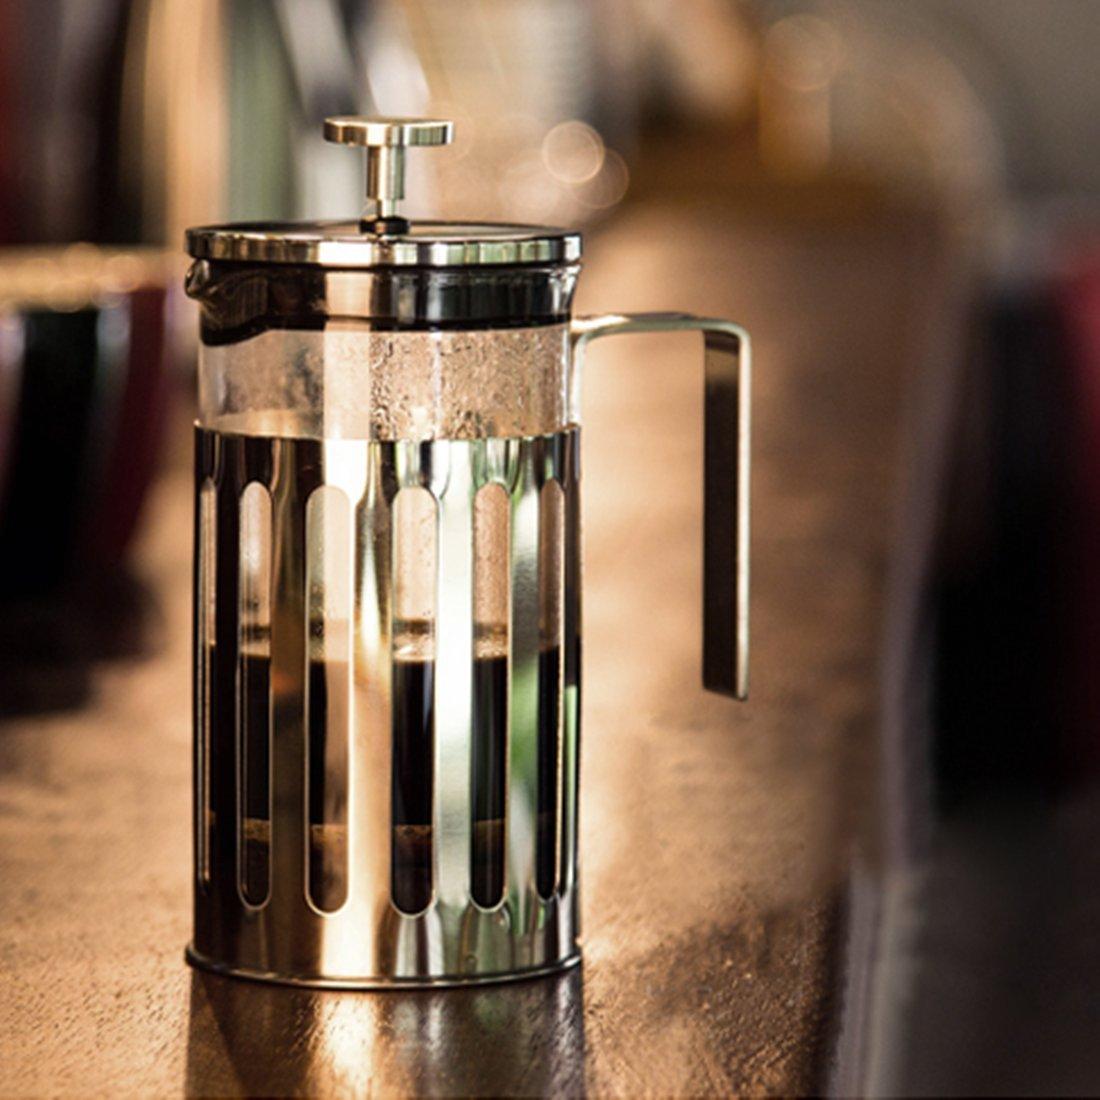 fecihor prensa francesa cafetera eléctrica, cristal de borosilicato - Cafetera - Jarra para café con cucharilla de café de acero inoxidable (350 ml/12oz) ...